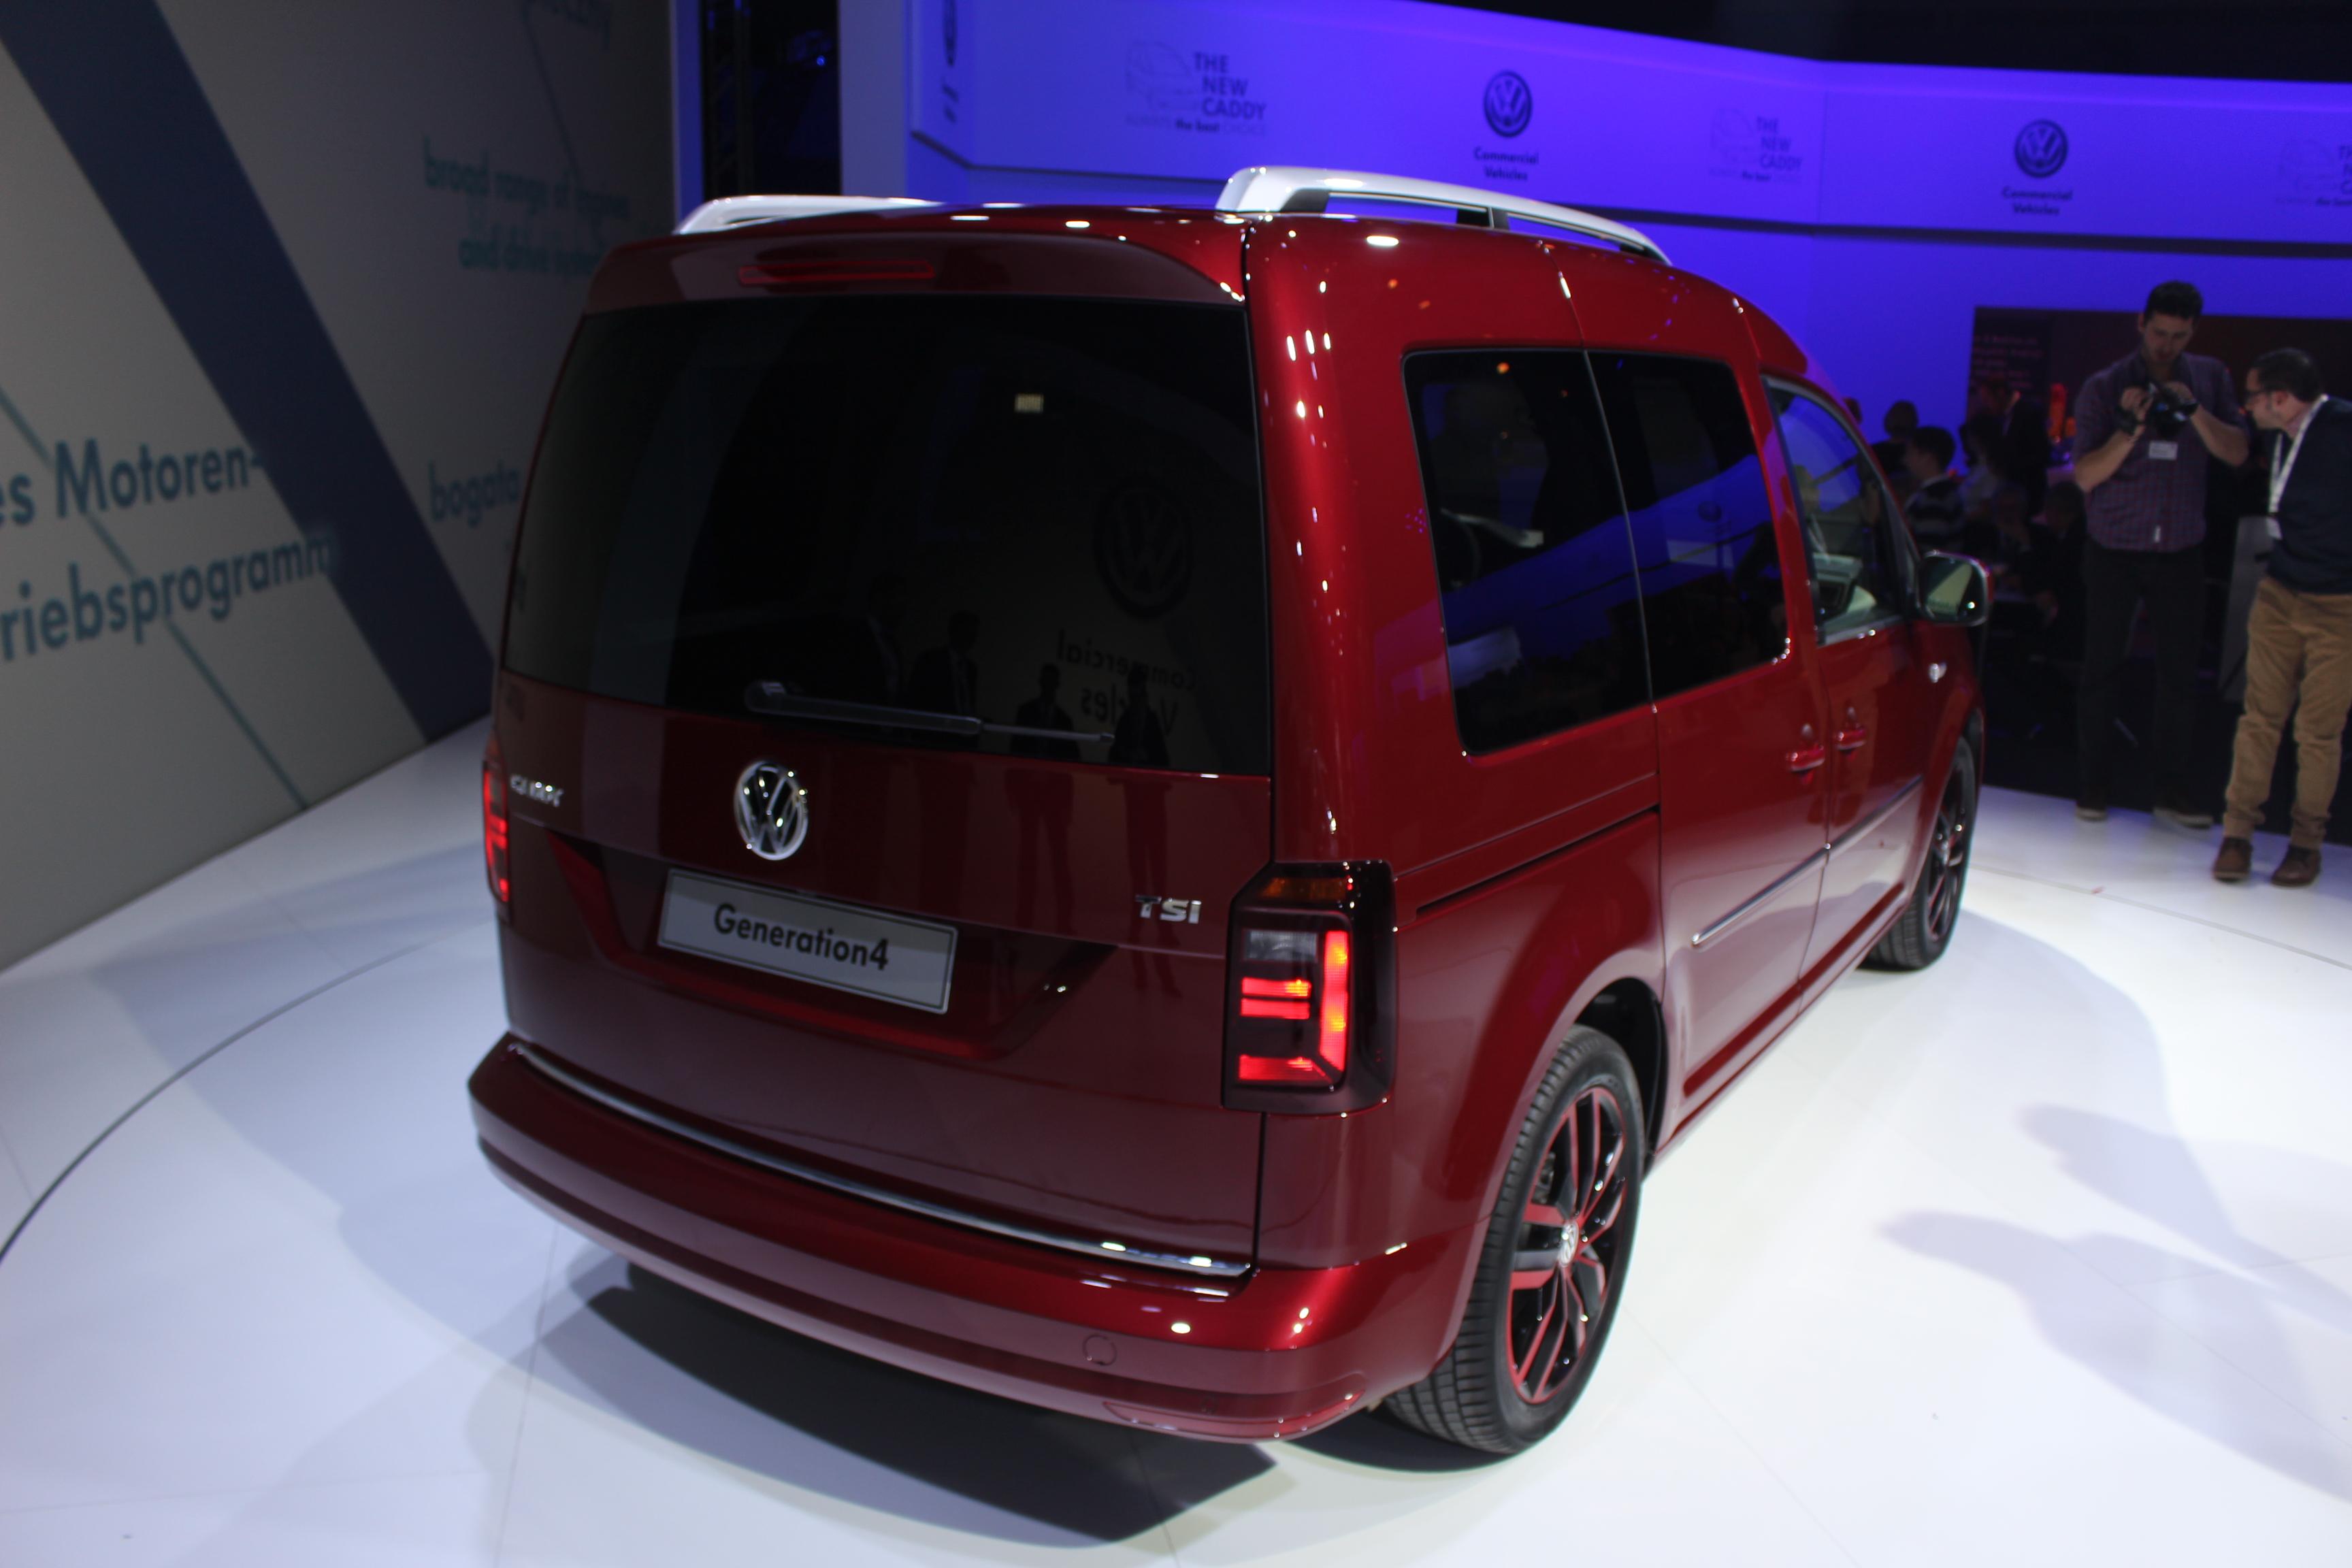 Pr 233 Sentation Vid 233 O Volkswagen Caddy 4 Caradisiac 233 Tait